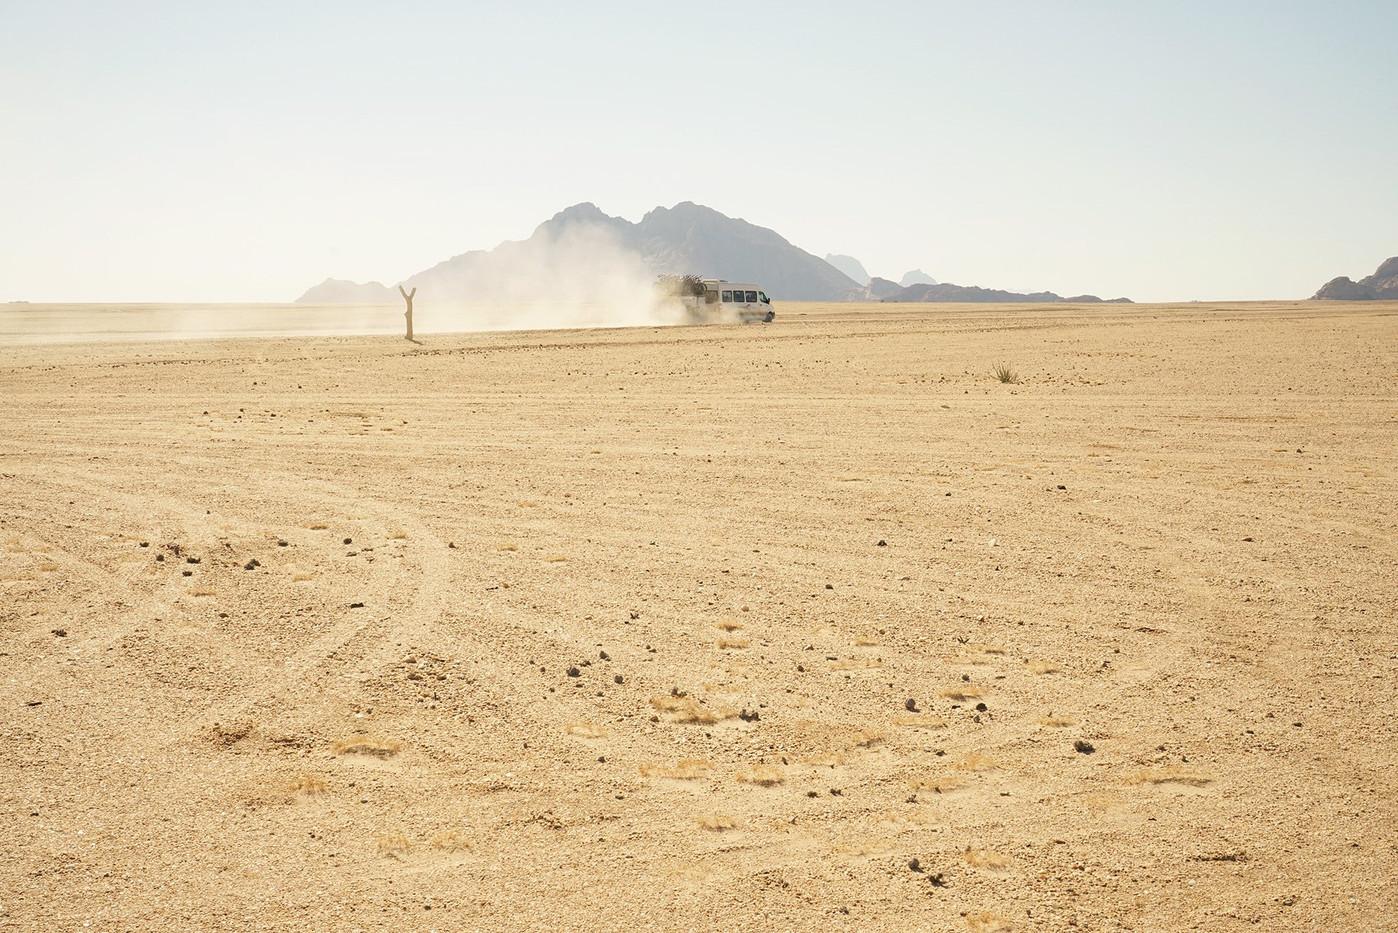 "Margaret Courtney-Clarke | ""Hope in a Sandstorm"", Namib Desert, July, 2018 (Detail of Triptych) | 2018 | Giclée Print on Hahnemühle PhotoRag | 33.5 x 50.5 cm | Edition of 6 + 2 AP"